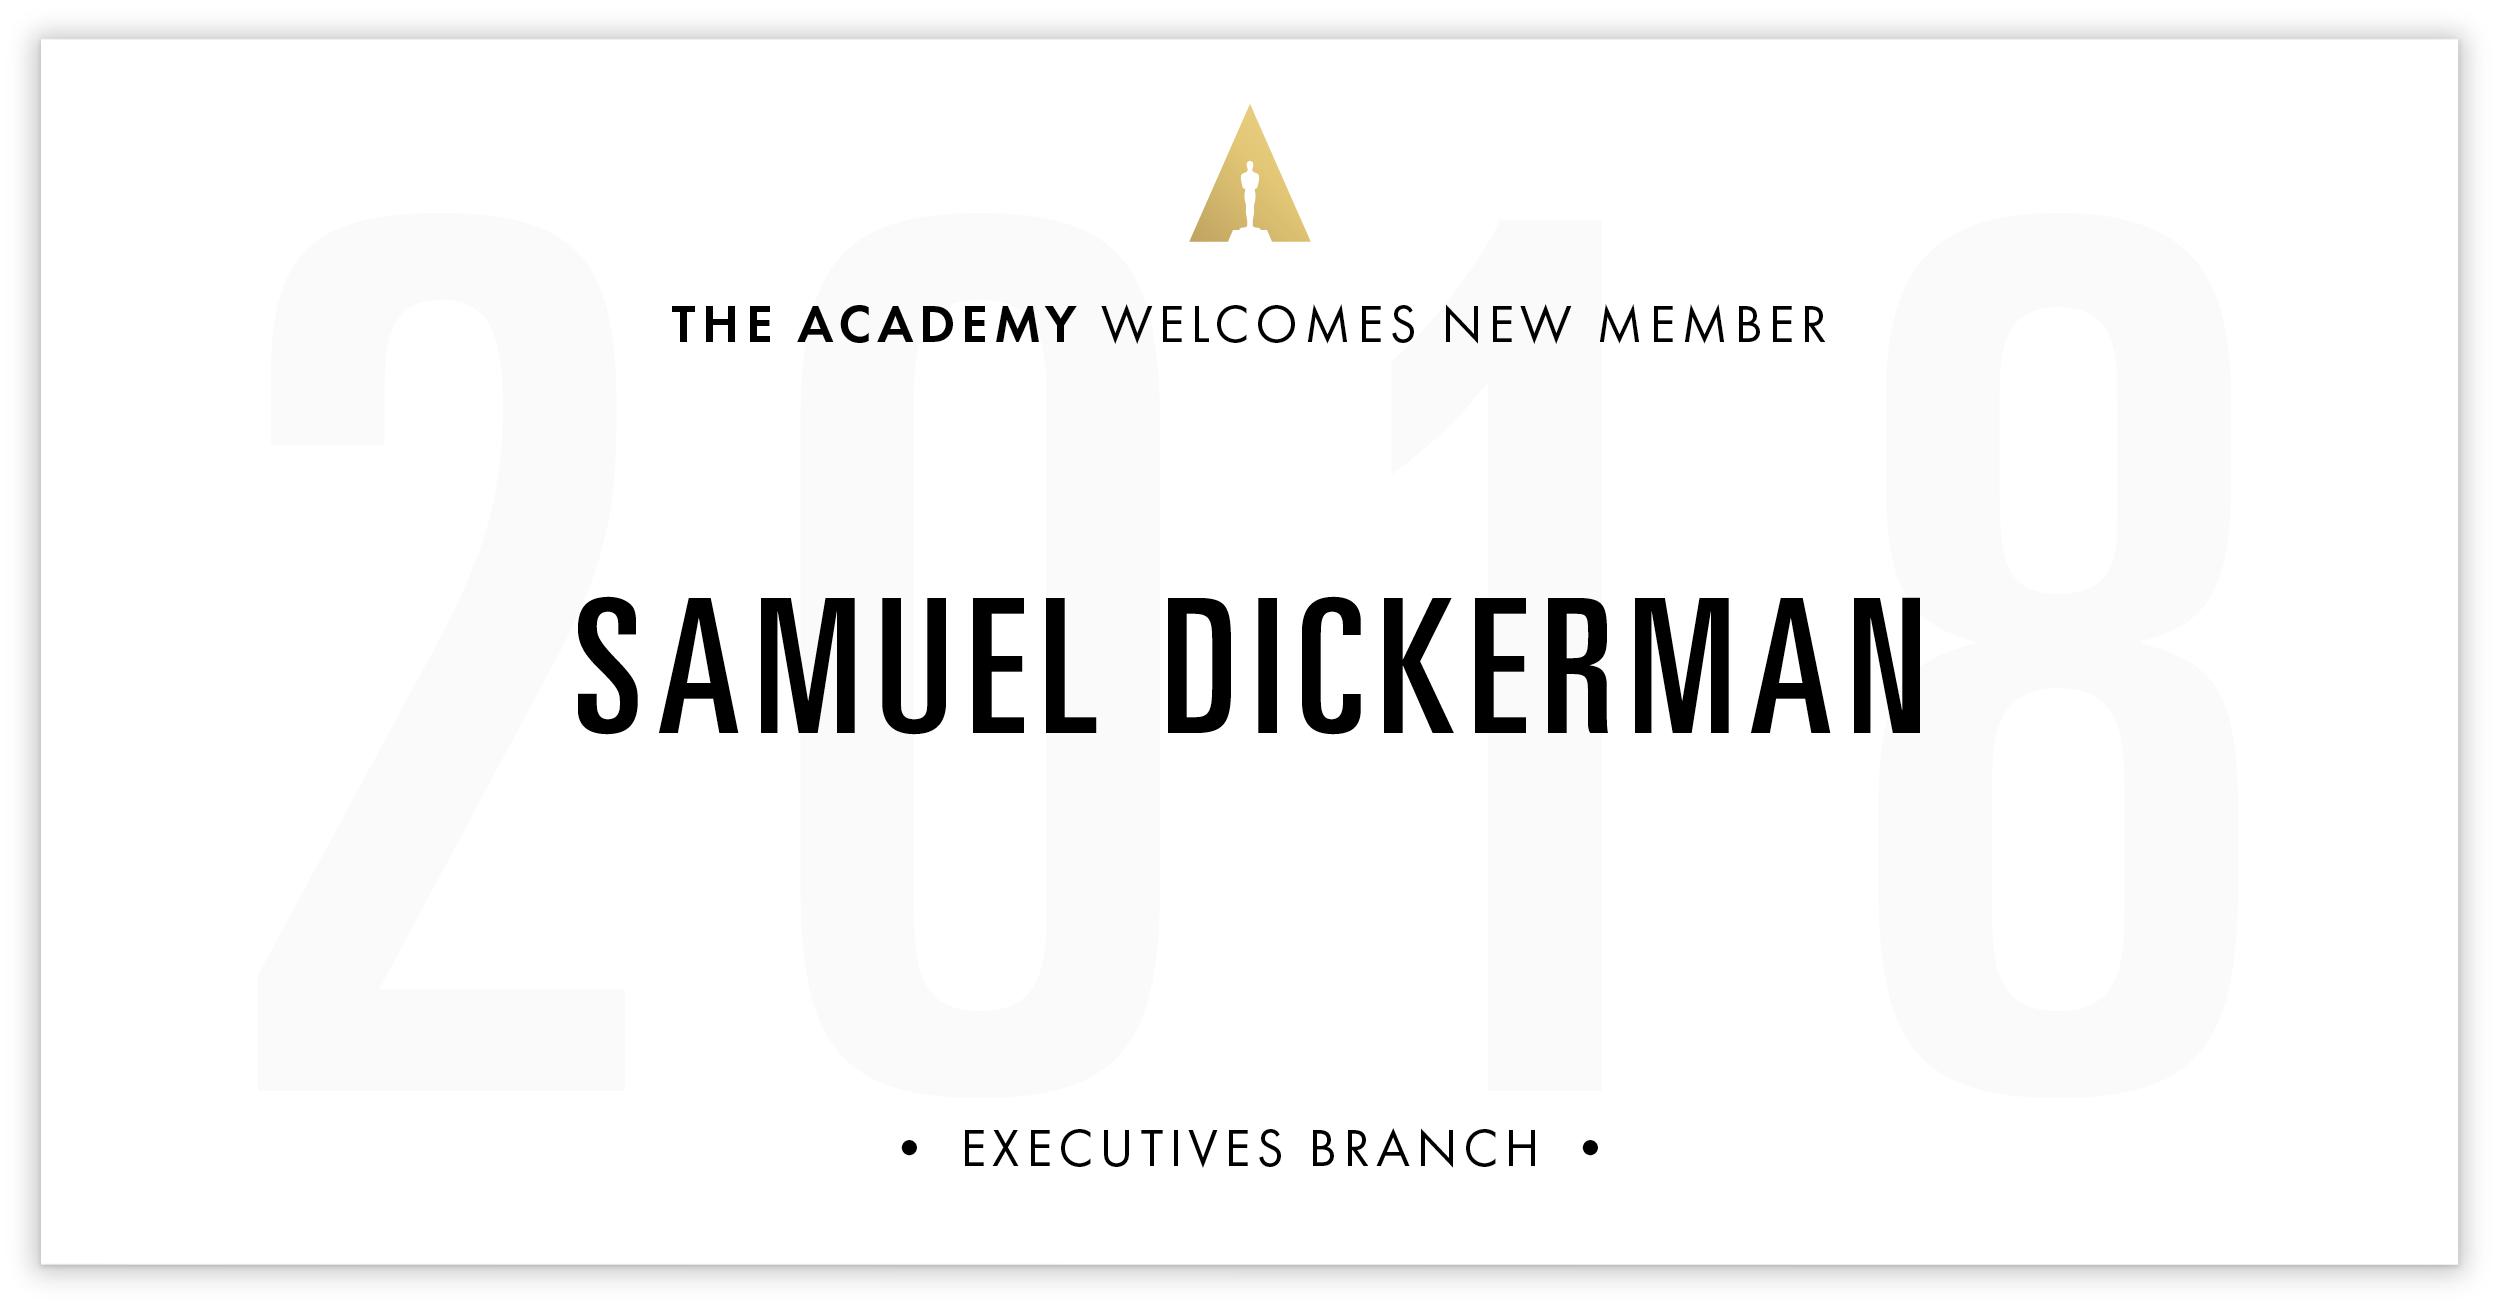 Samuel Dickerman is invited!